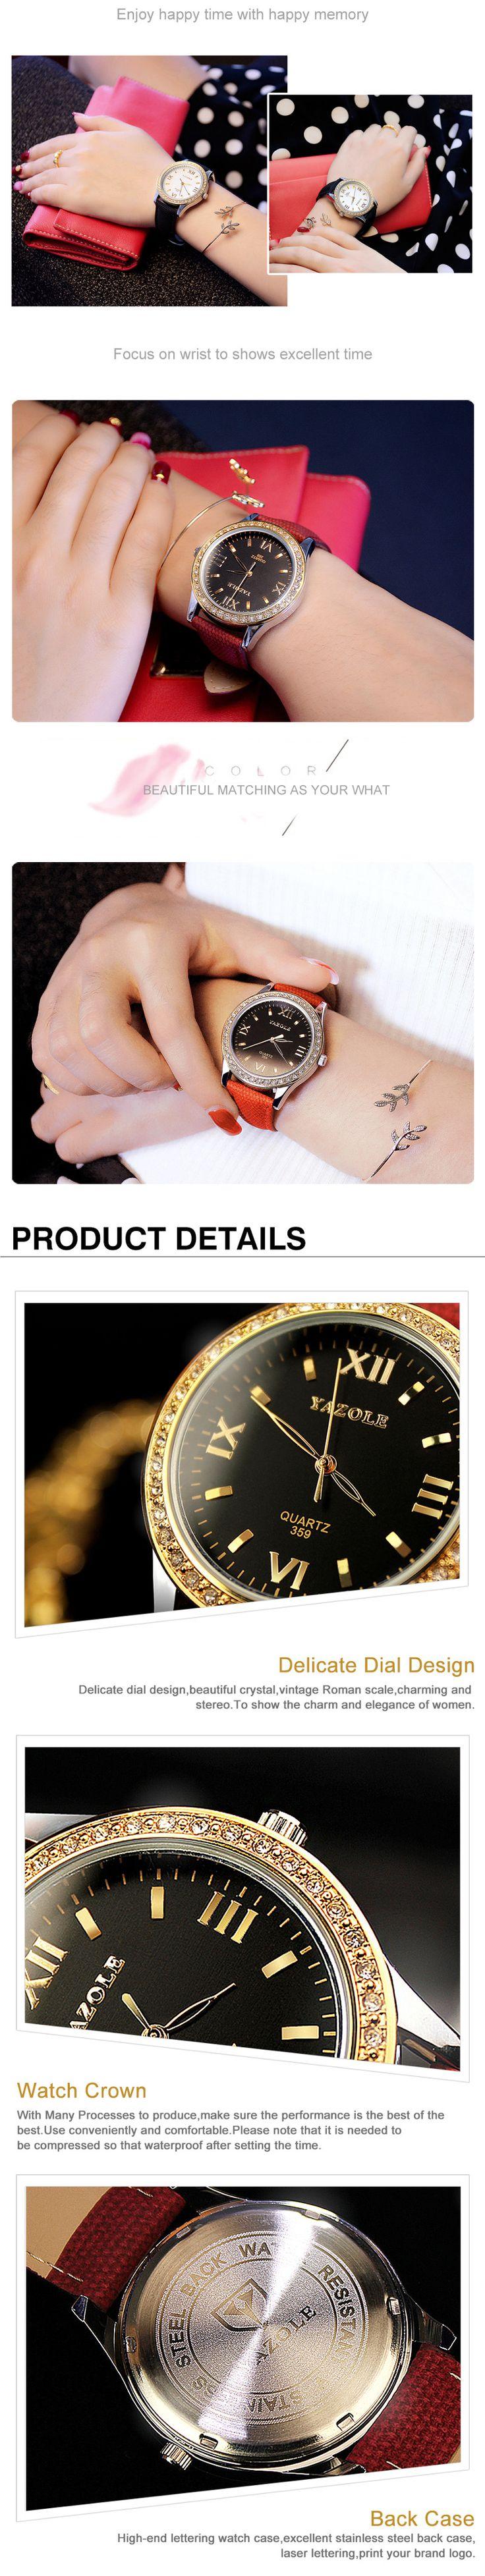 YAZOLE 359 Vintage Rhinestones Women Quartz Watch Fashion Leather Strap Wrist Watch